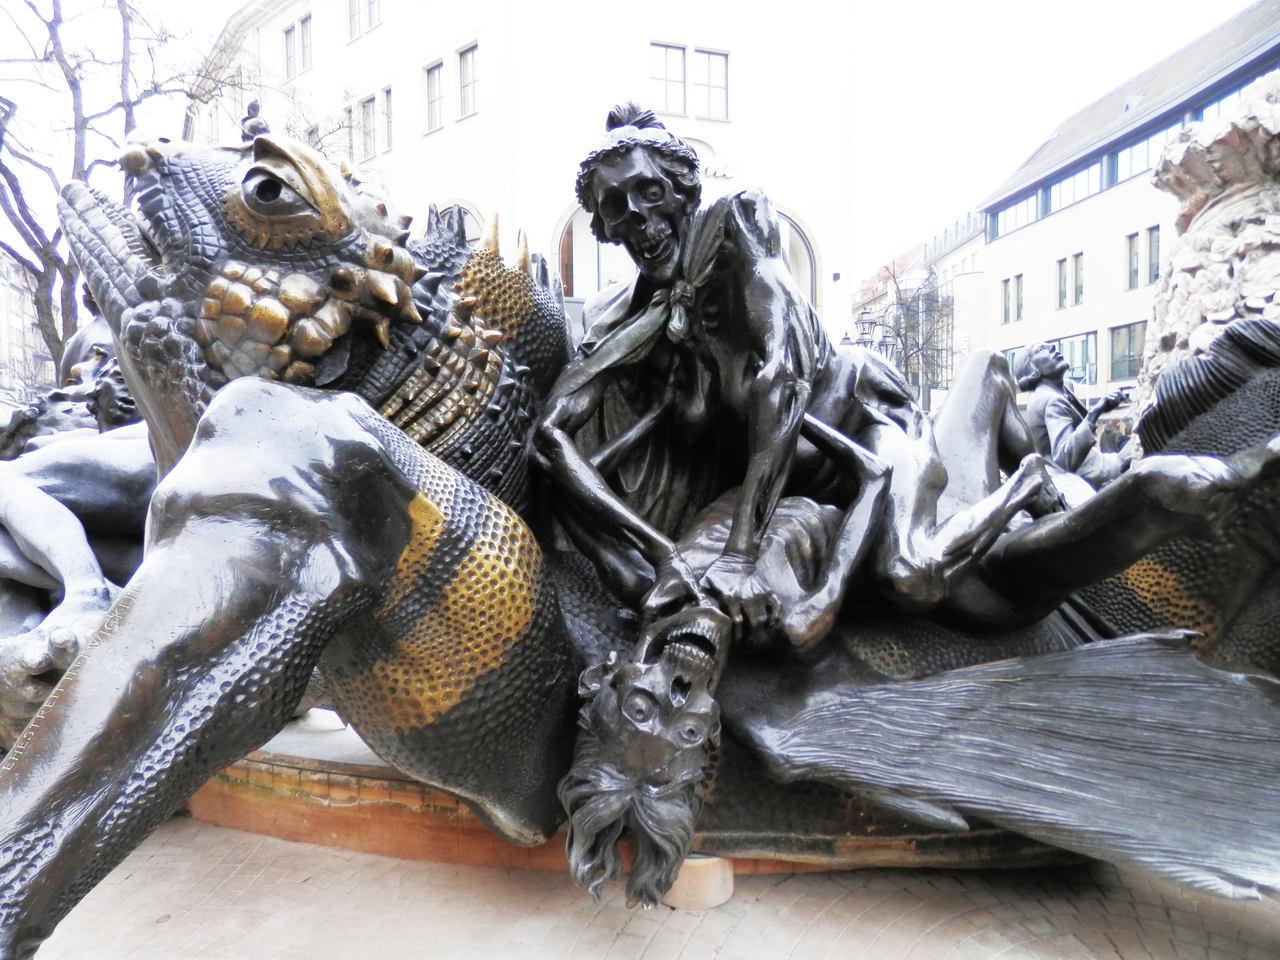 Ehekarussell Nuremberg